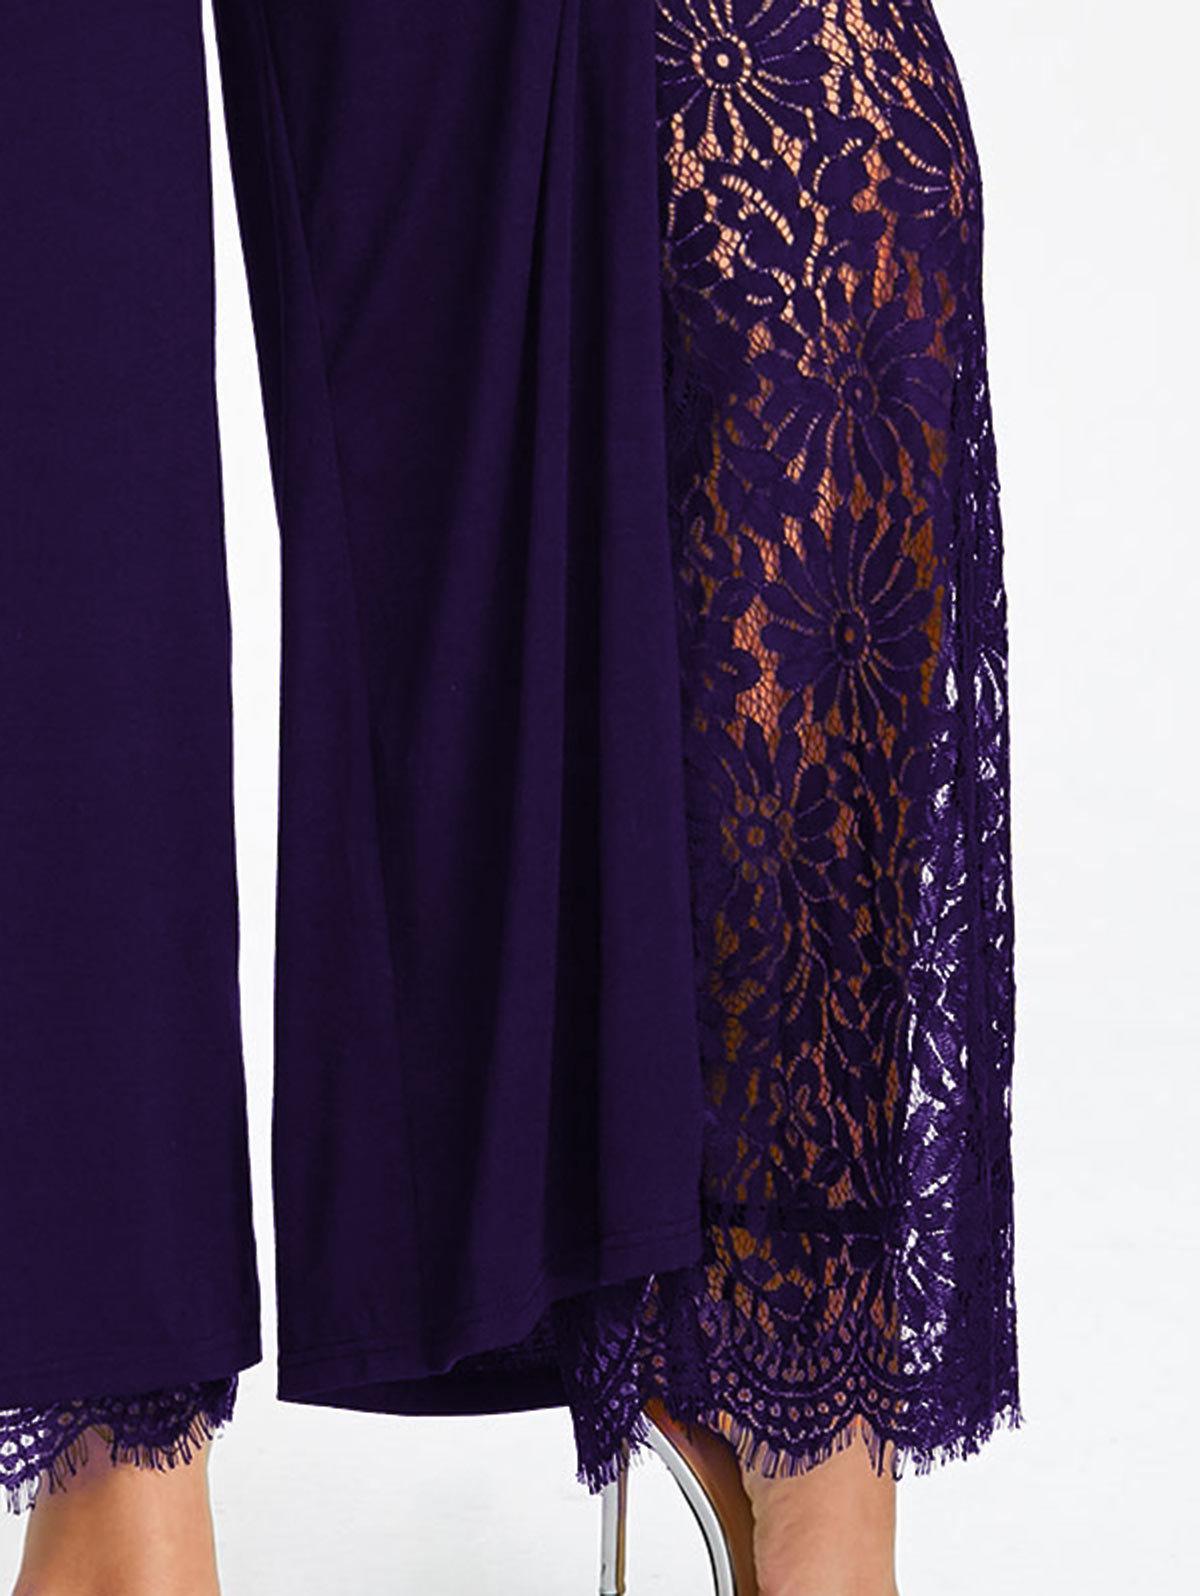 Gamiss Women Wide Leg Pants Plus Size High Slit Lace Lined Palazzo Pants Mid Elastic Waist Female Fashion Long Loose Trousers D1892603